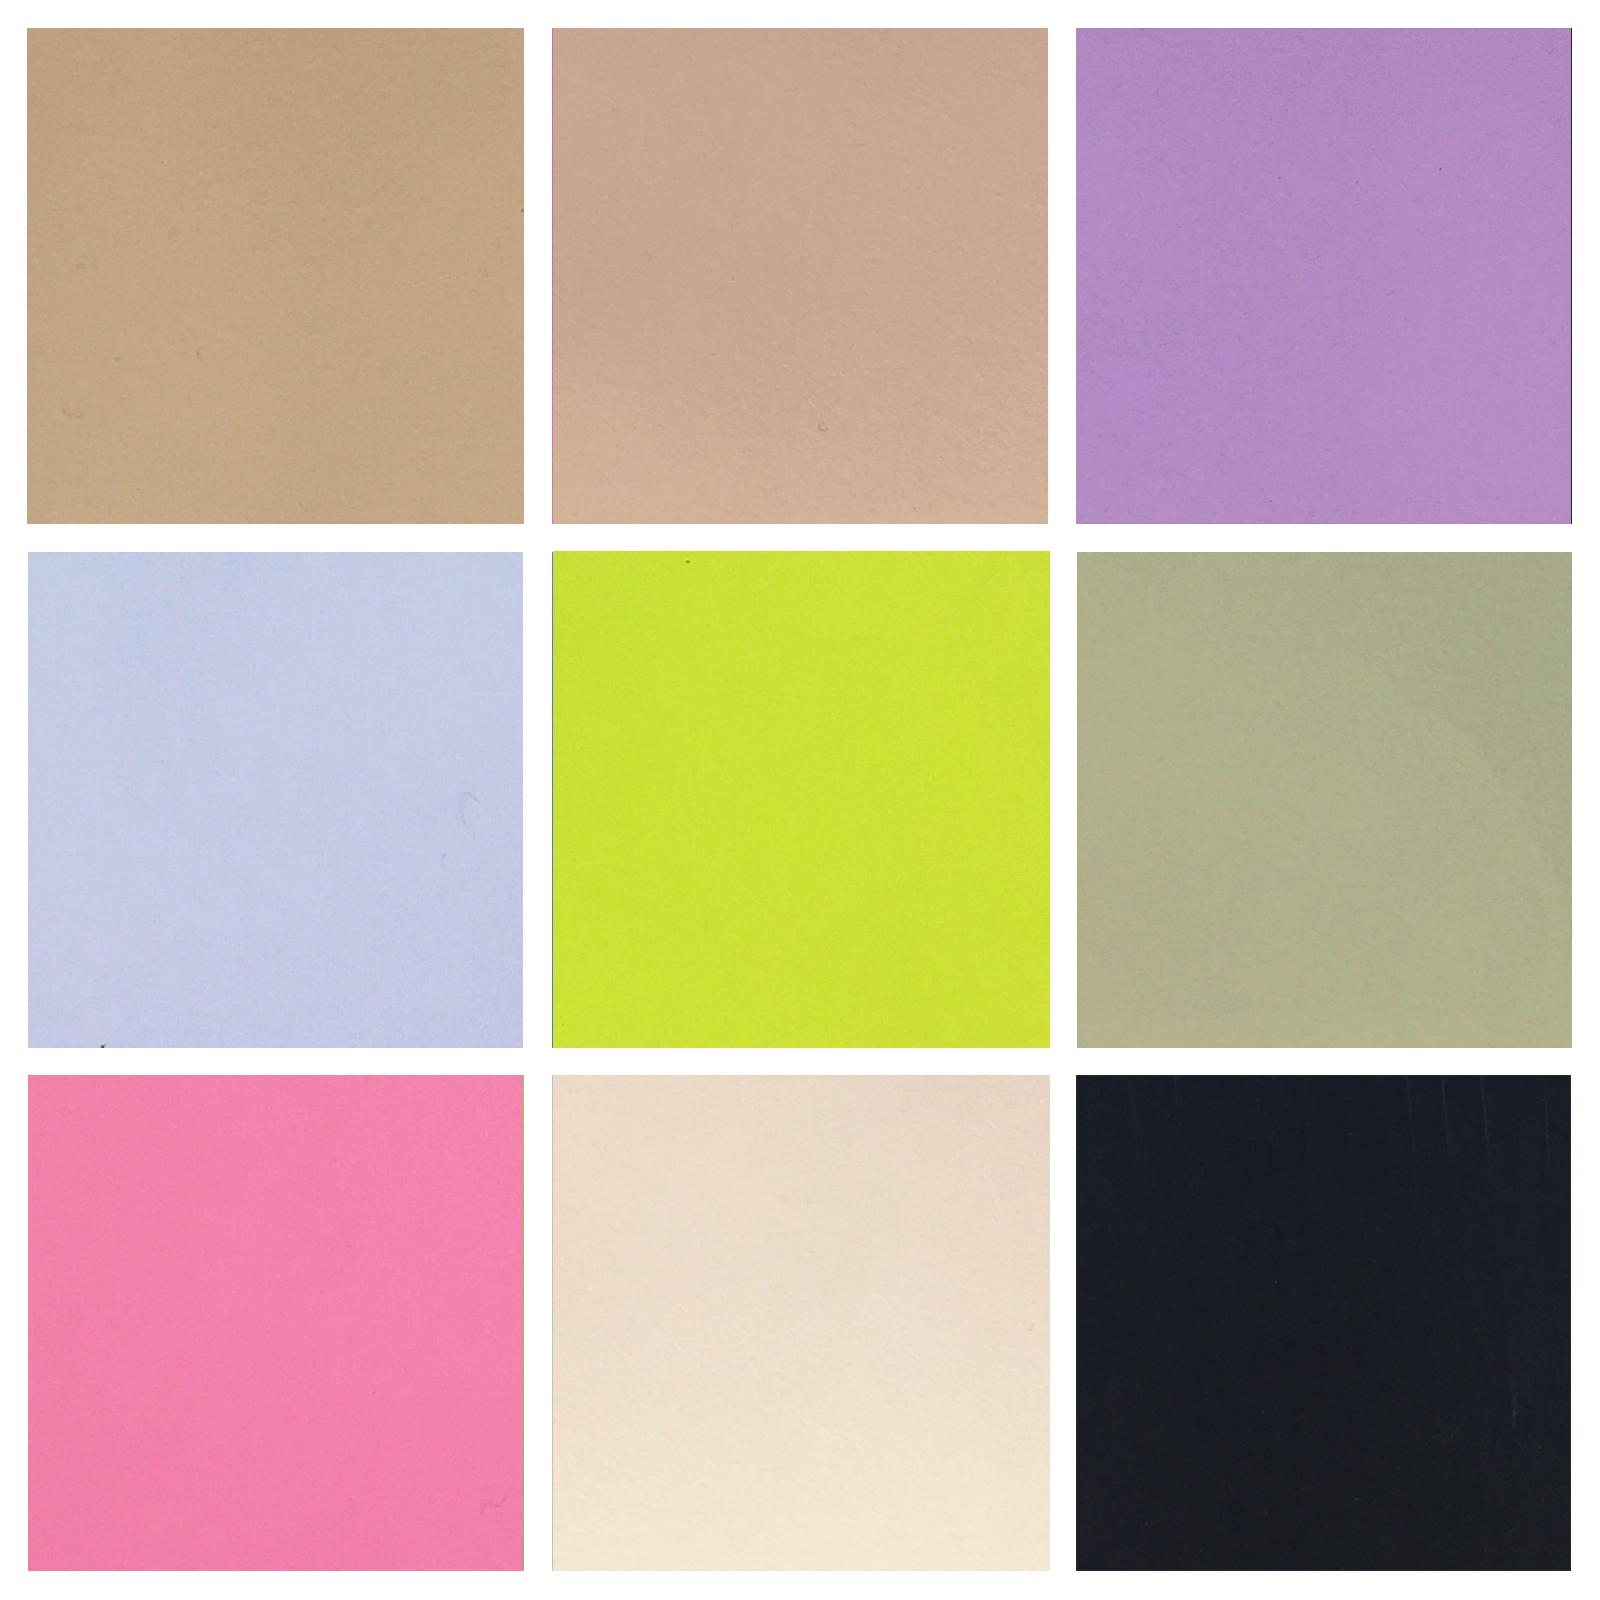 whiteboardverf-kleurstalen-klein